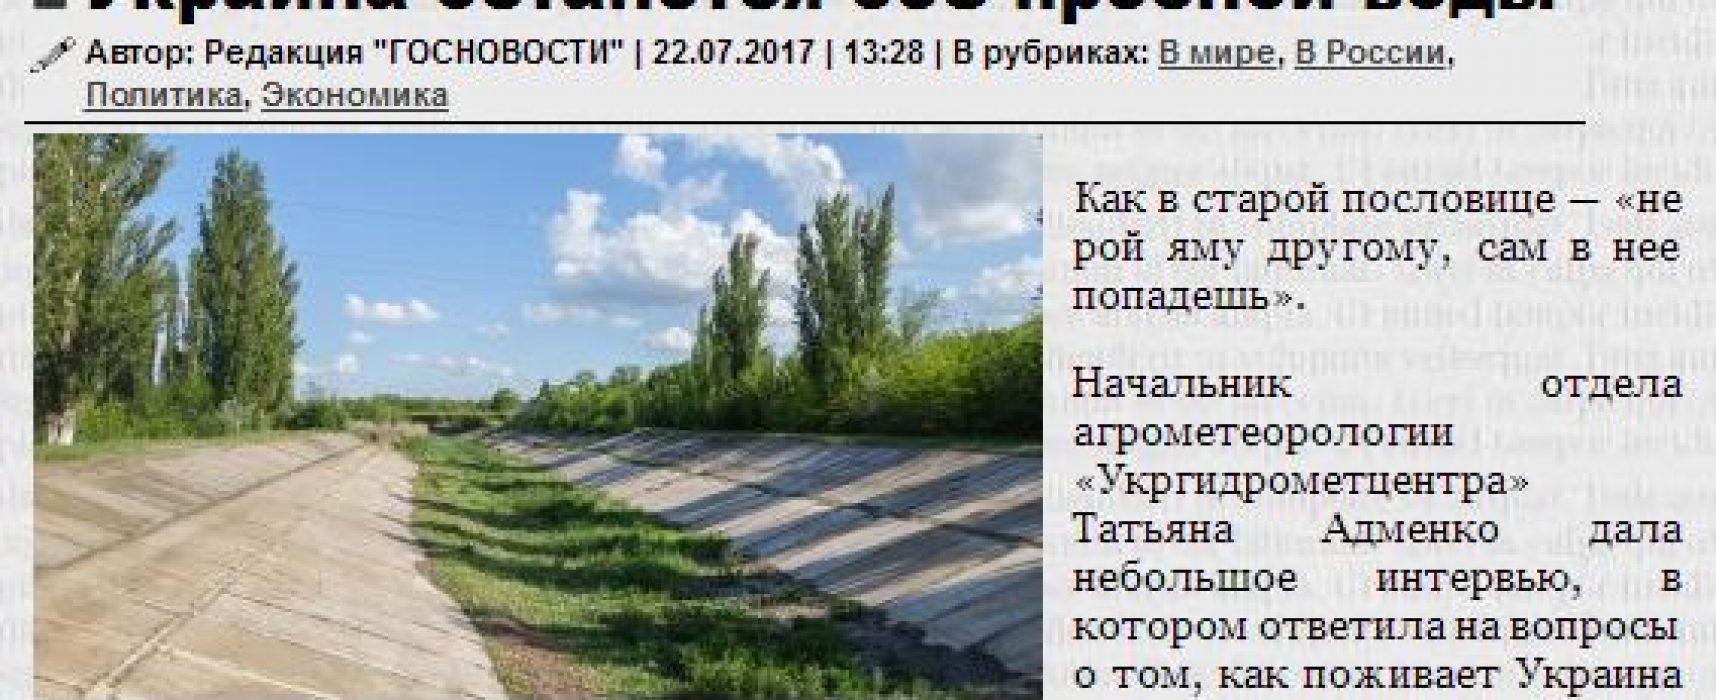 Fake: Ukraine Drying Up Having Cut Off Water to Crimea